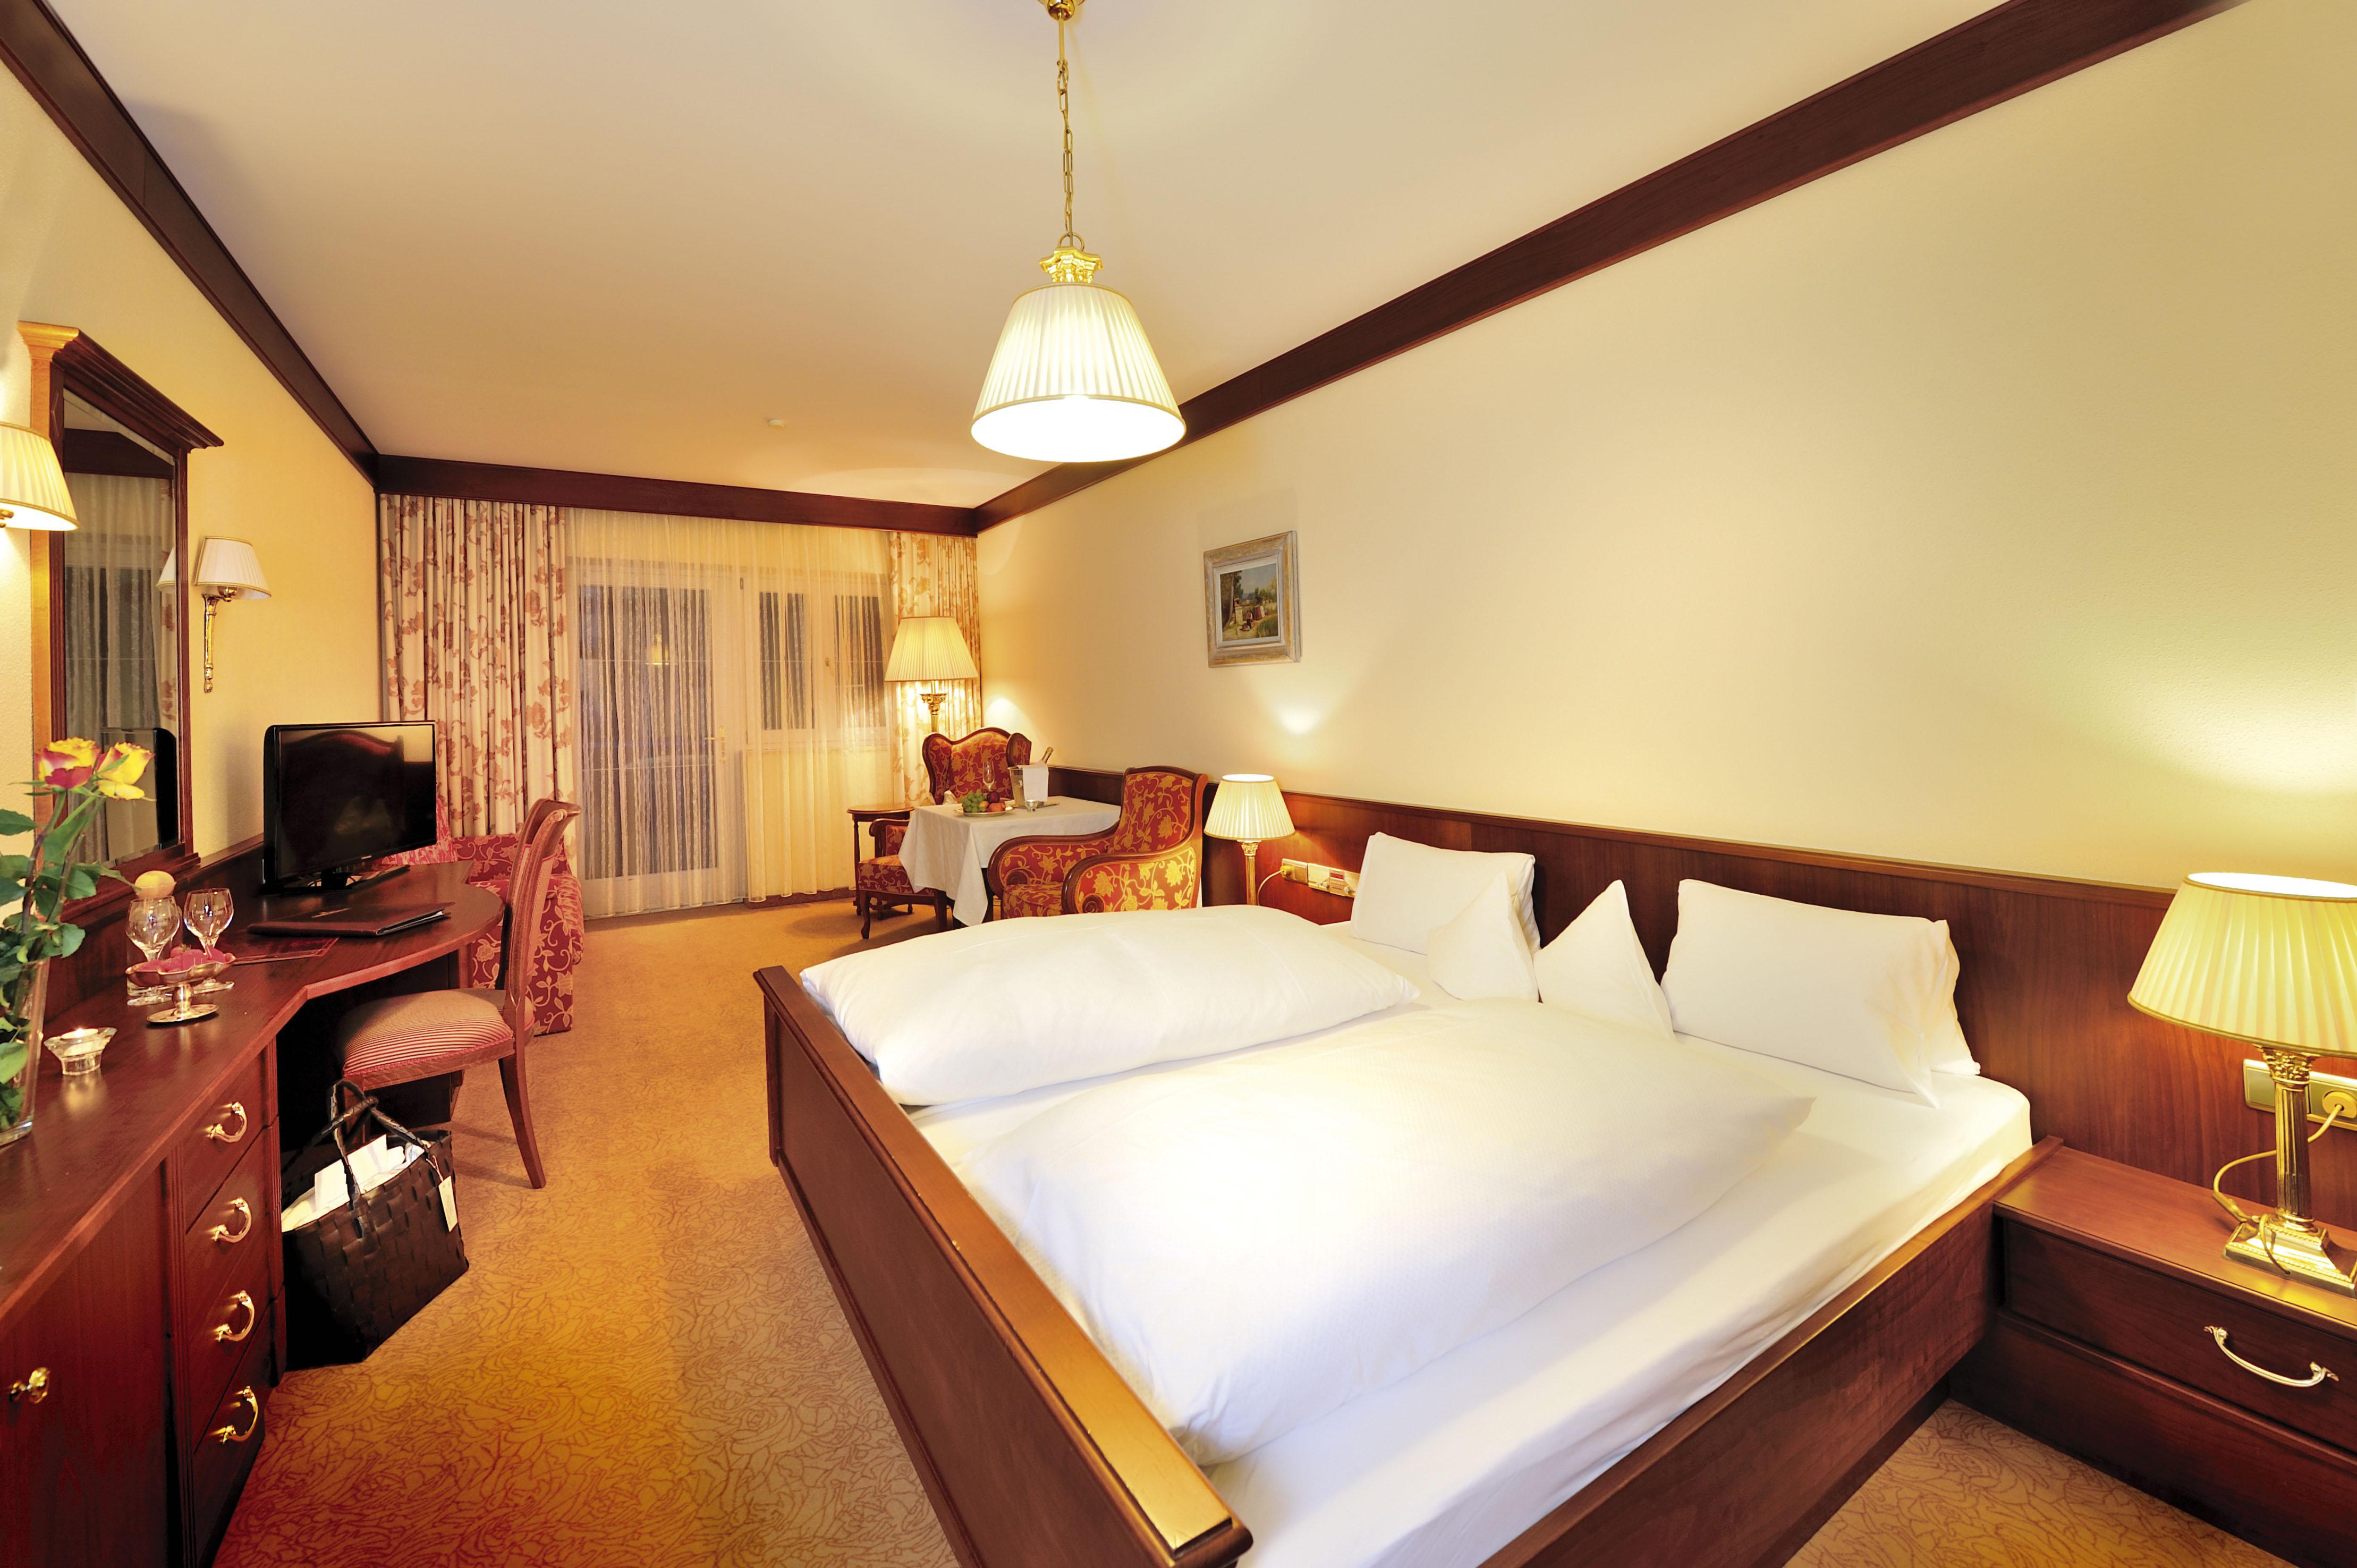 Wohnkomfortzimmer Klassik im Wellnesshotel Alpbacherhof in Tirol